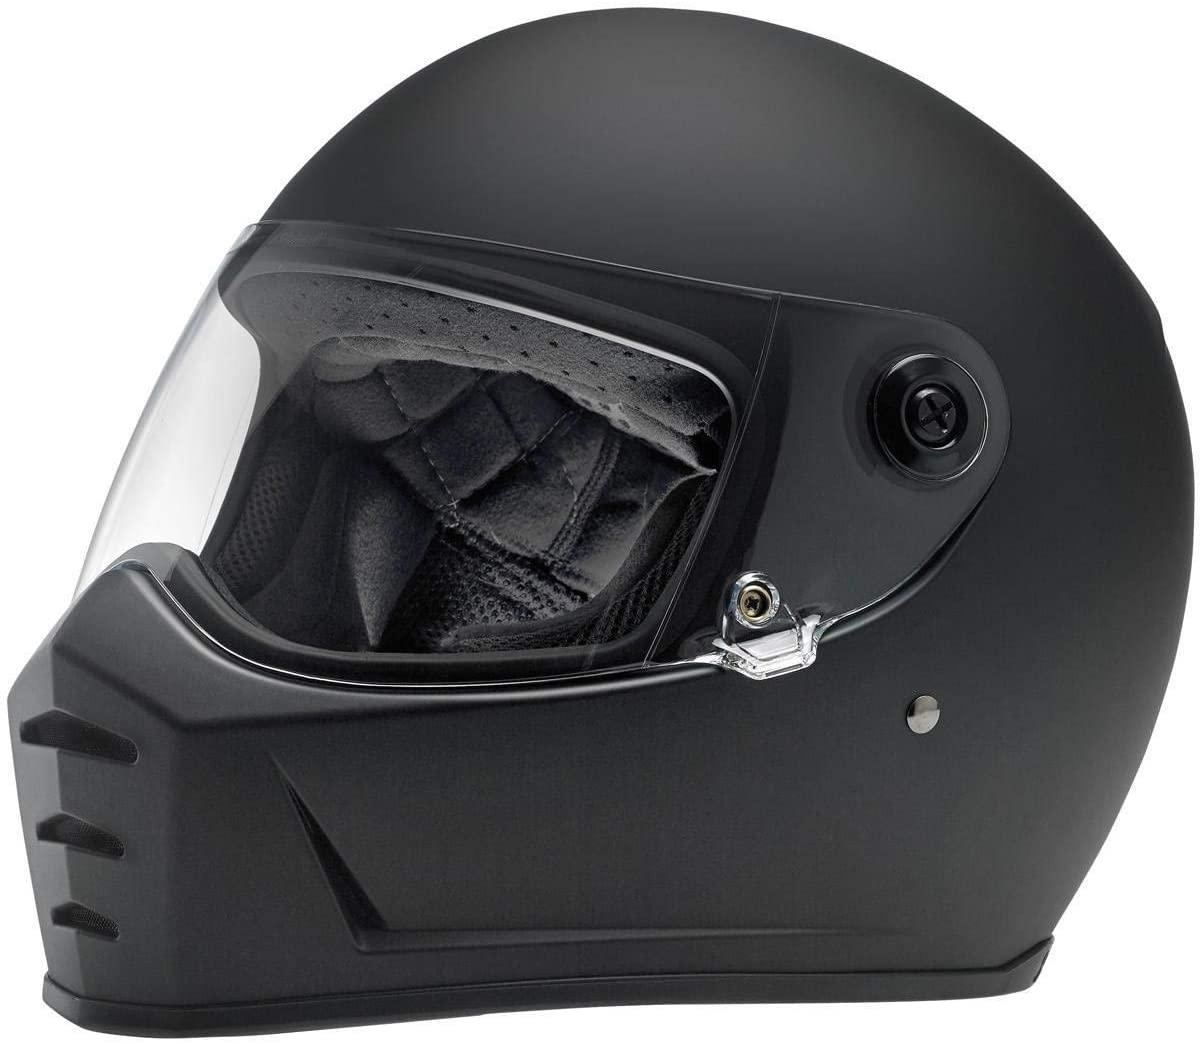 Biltwell Lane Splitter Solid Full-face Motorcycle Helmet - Flat Black/X-Small